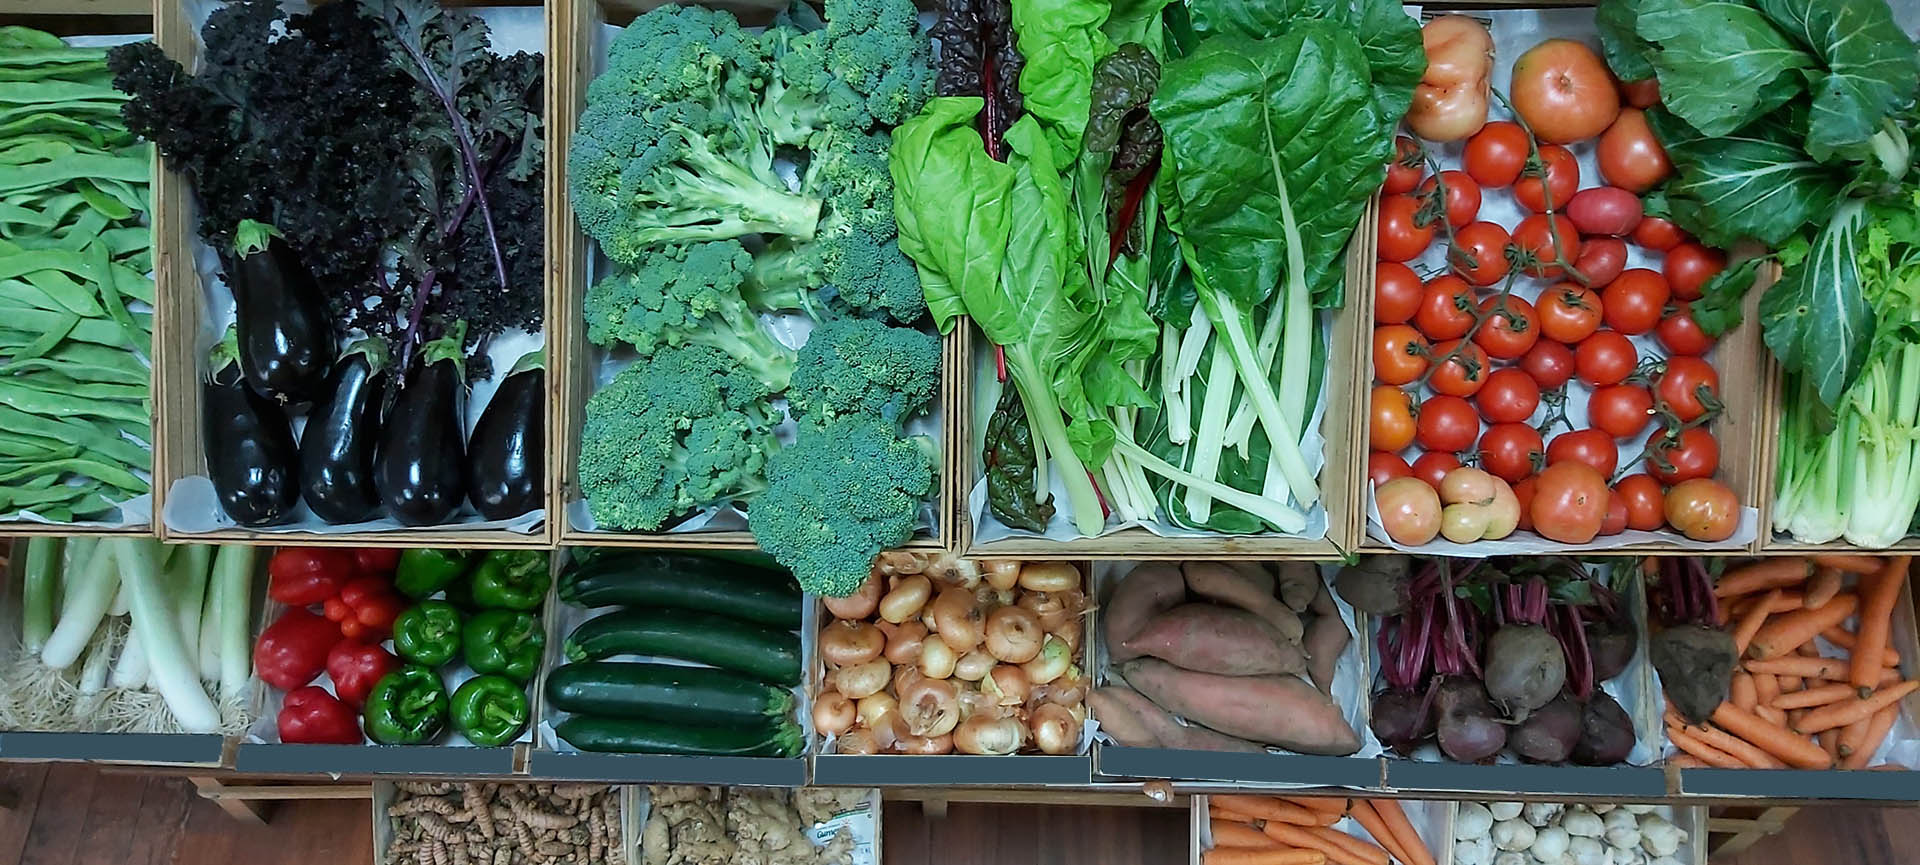 cesta-verduras-a-cesta-da-saude